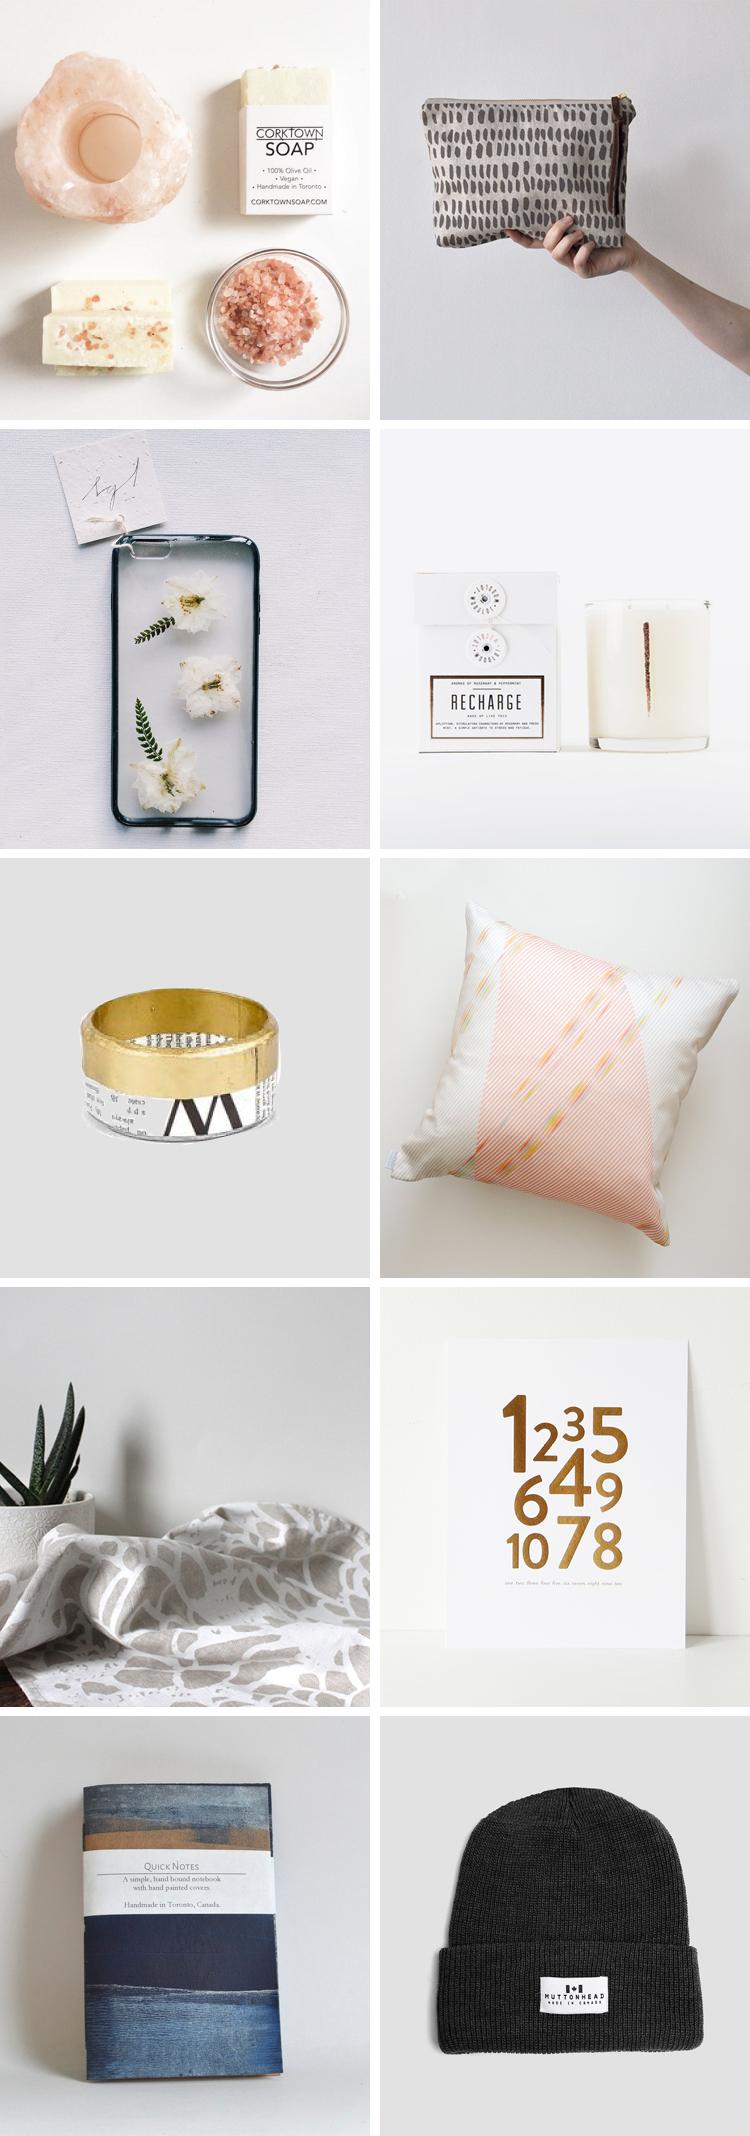 loveonsunday-xmas-gift-ideas-toronto.jpg